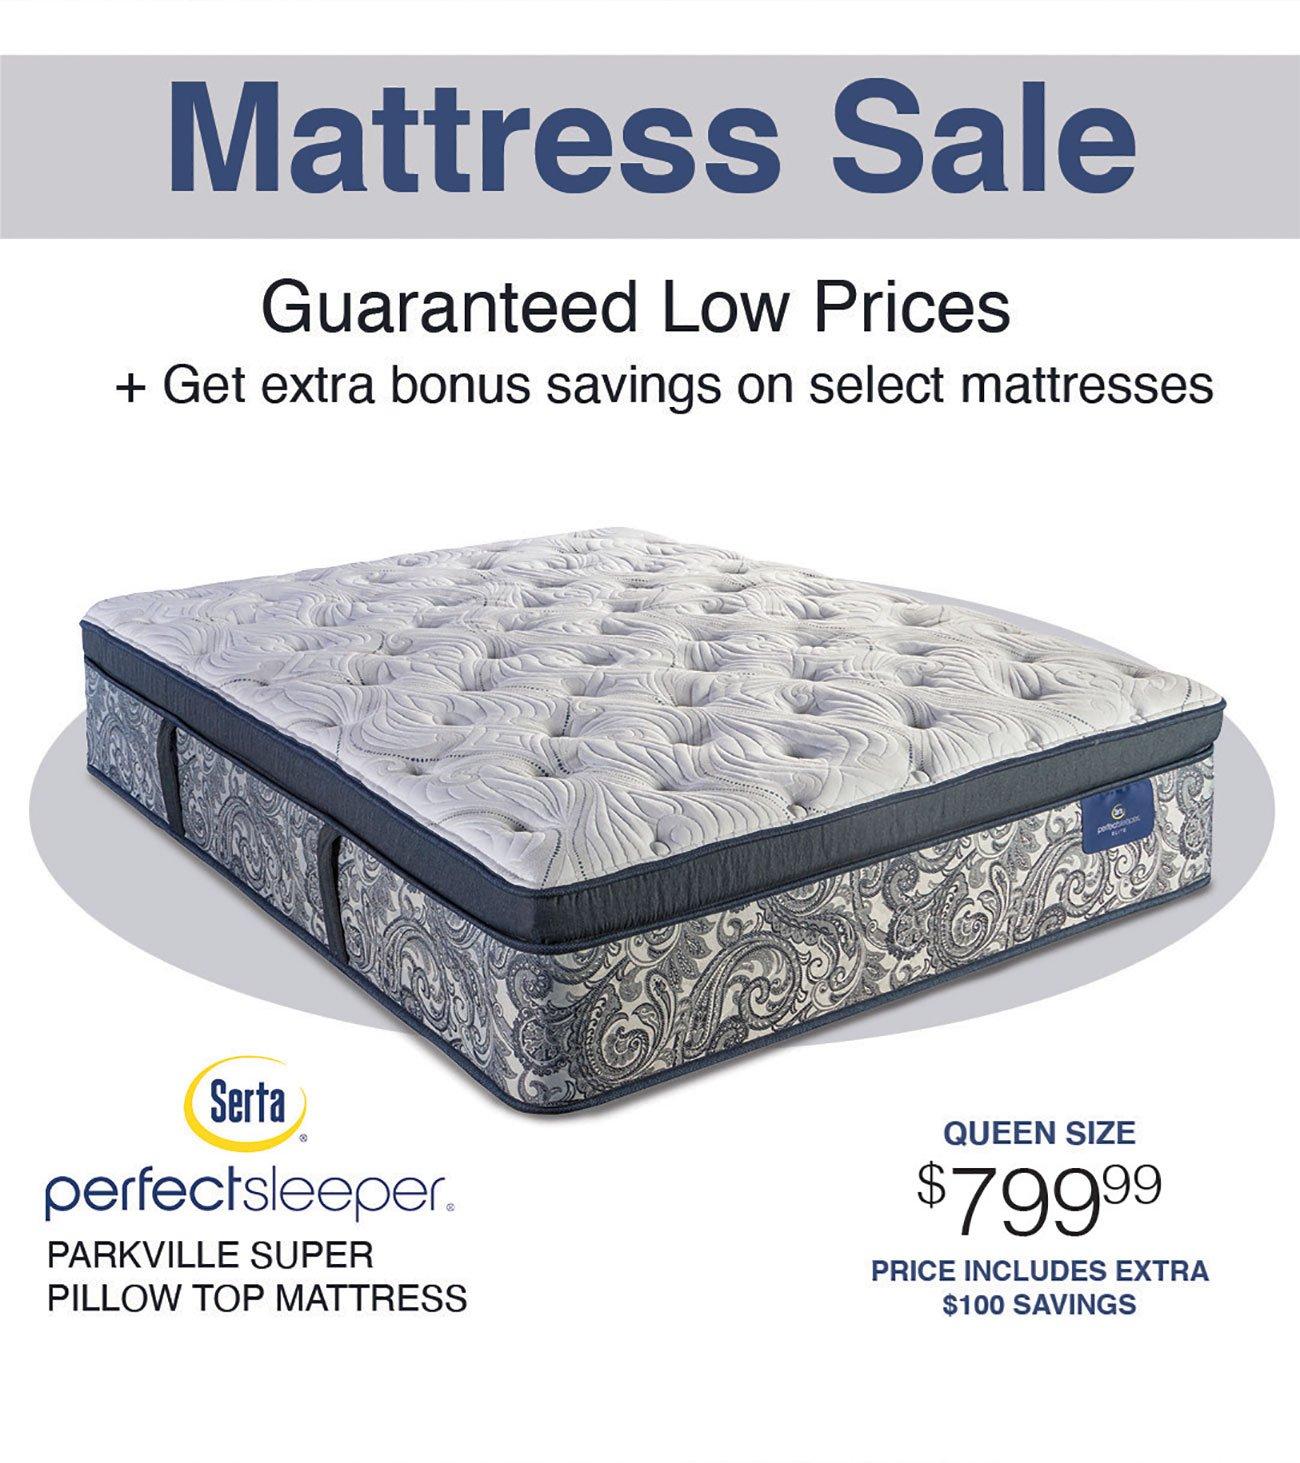 Mattress-Sale-Serta-Parkville-Mattress